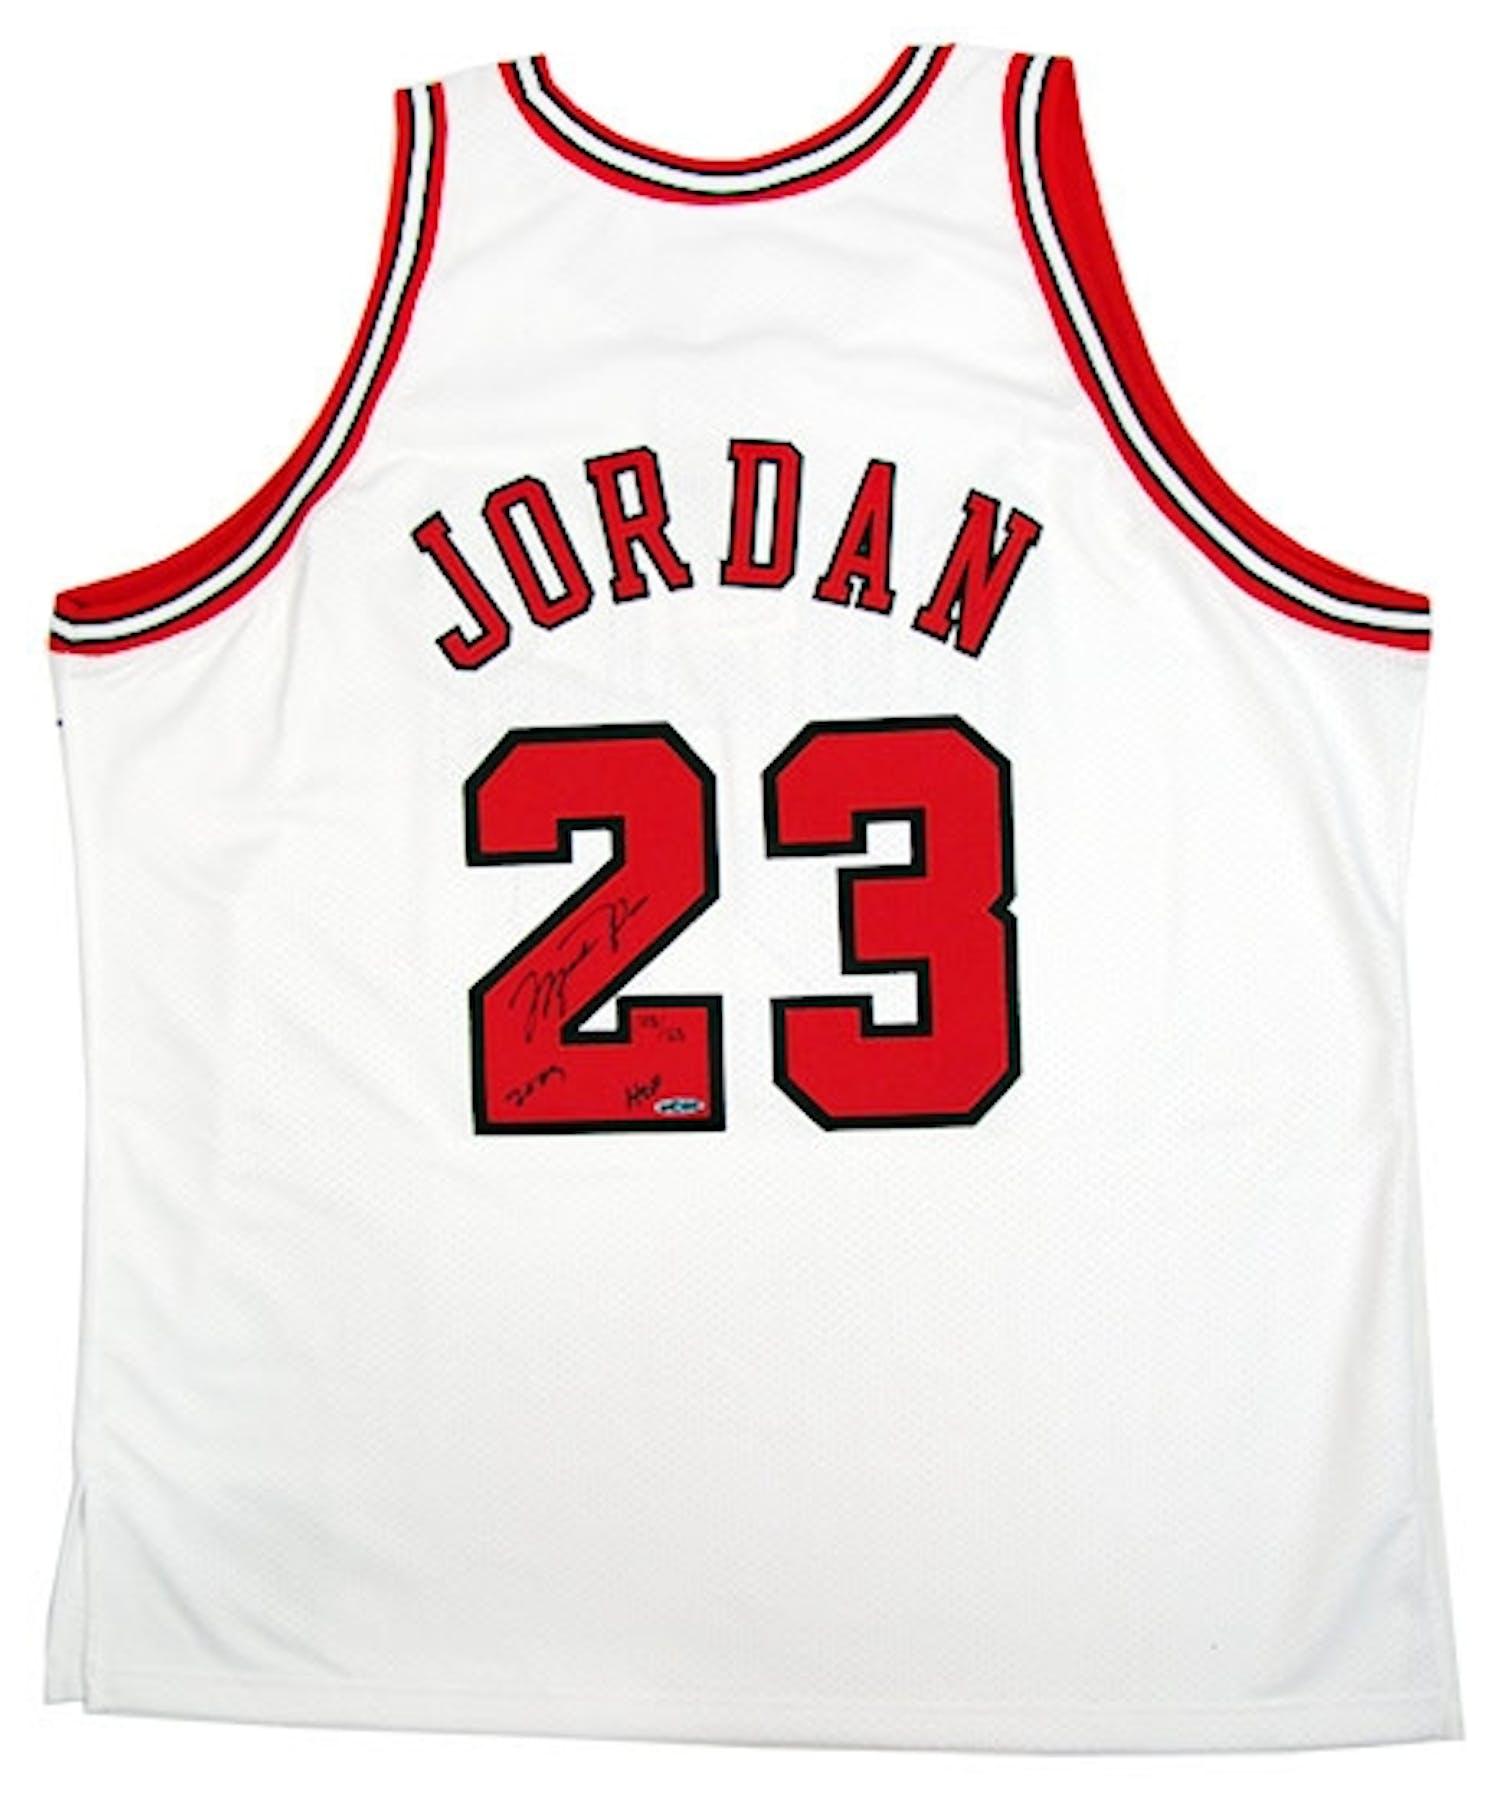 b728d9728e4 Michael Jordan Autographed Chicago Bulls HOF 2009   123 White ...